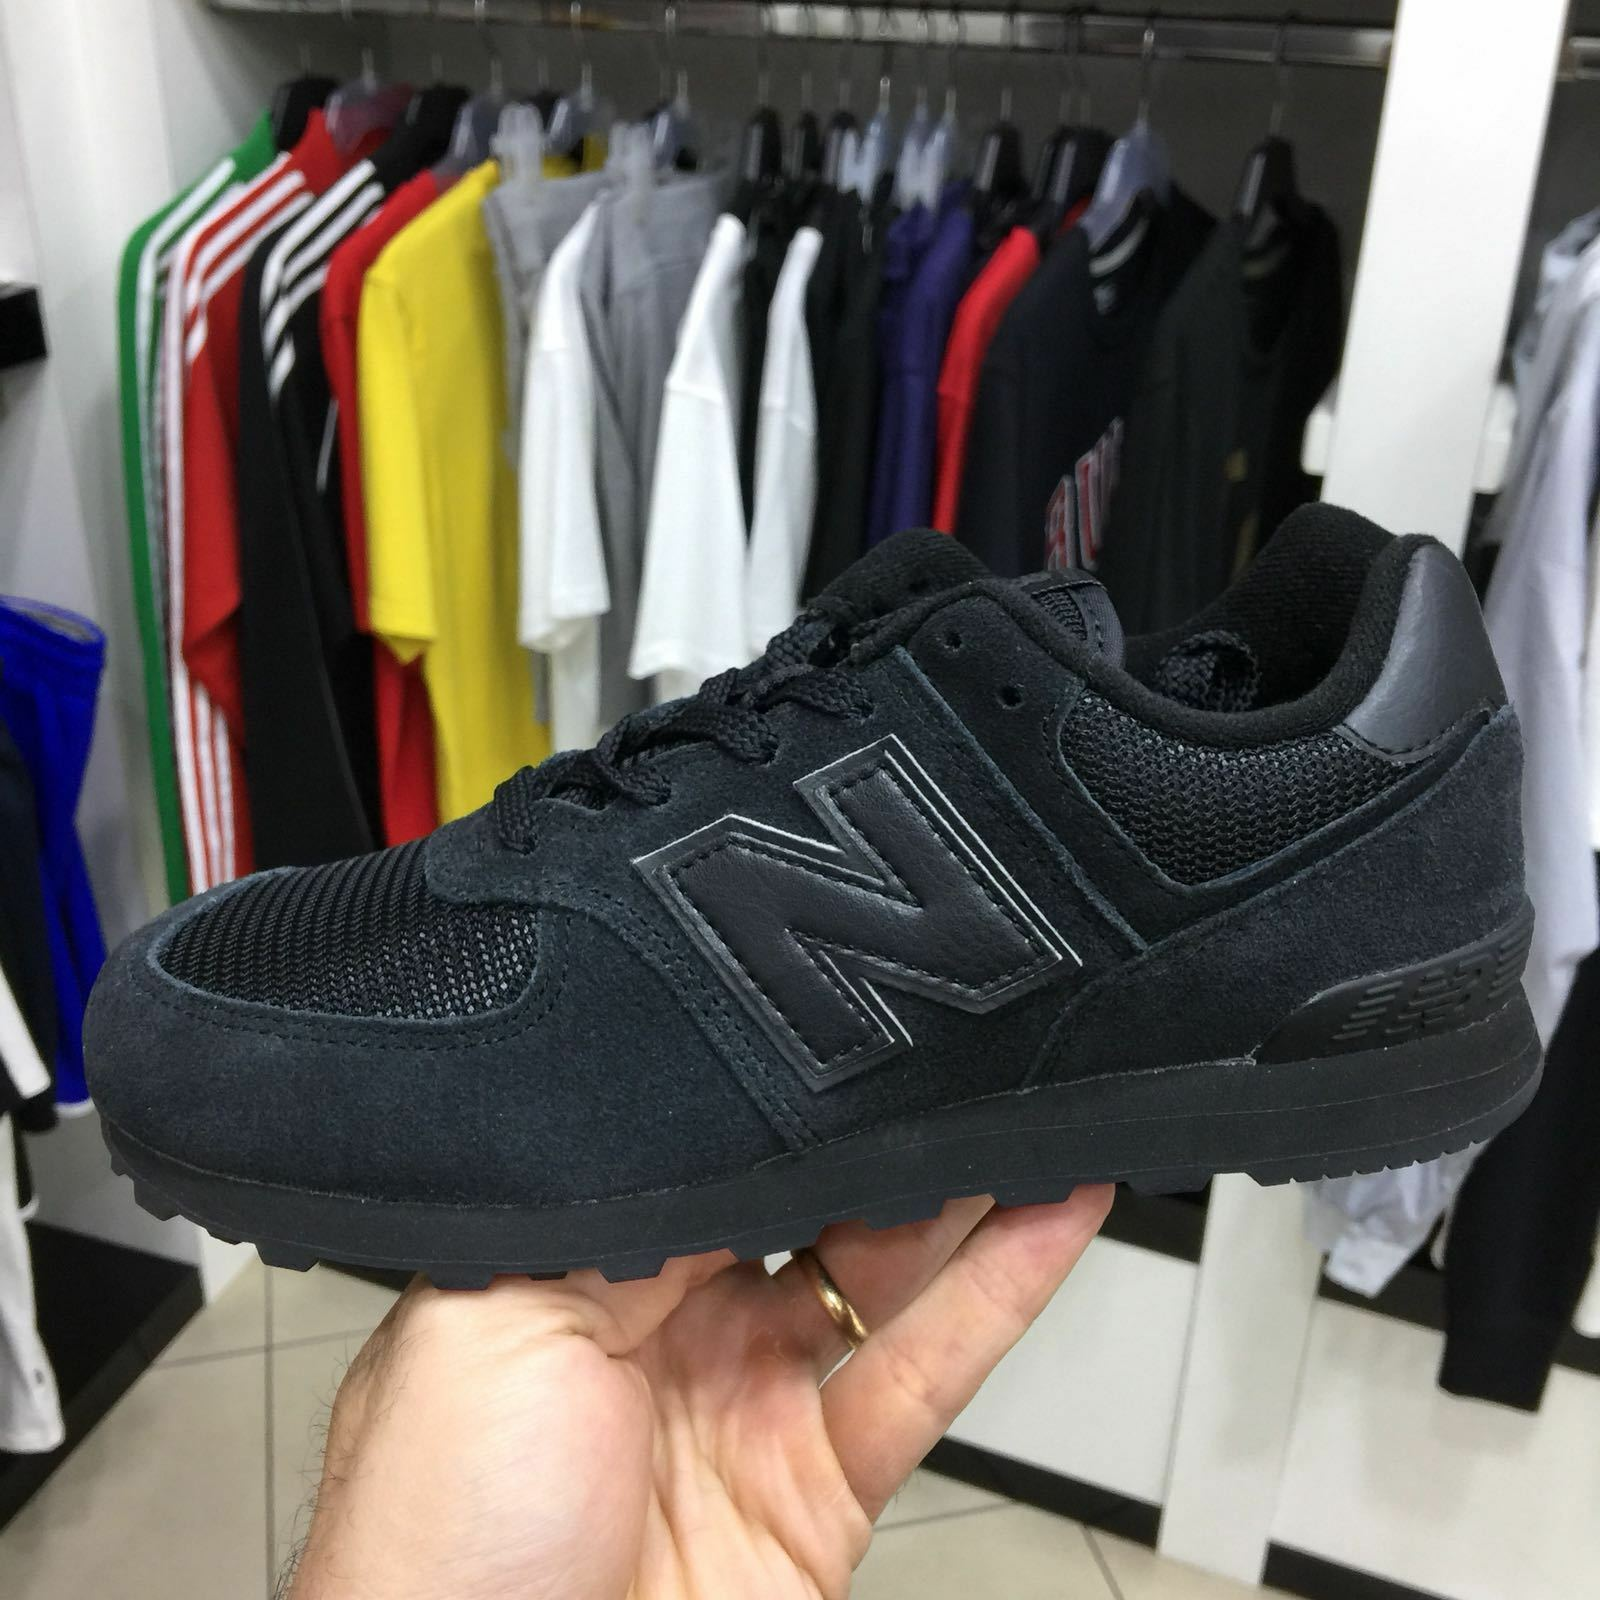 New Balance 574 shoes Sneaker Ragazzo Ragazza black Total BLACK new arrive 2018